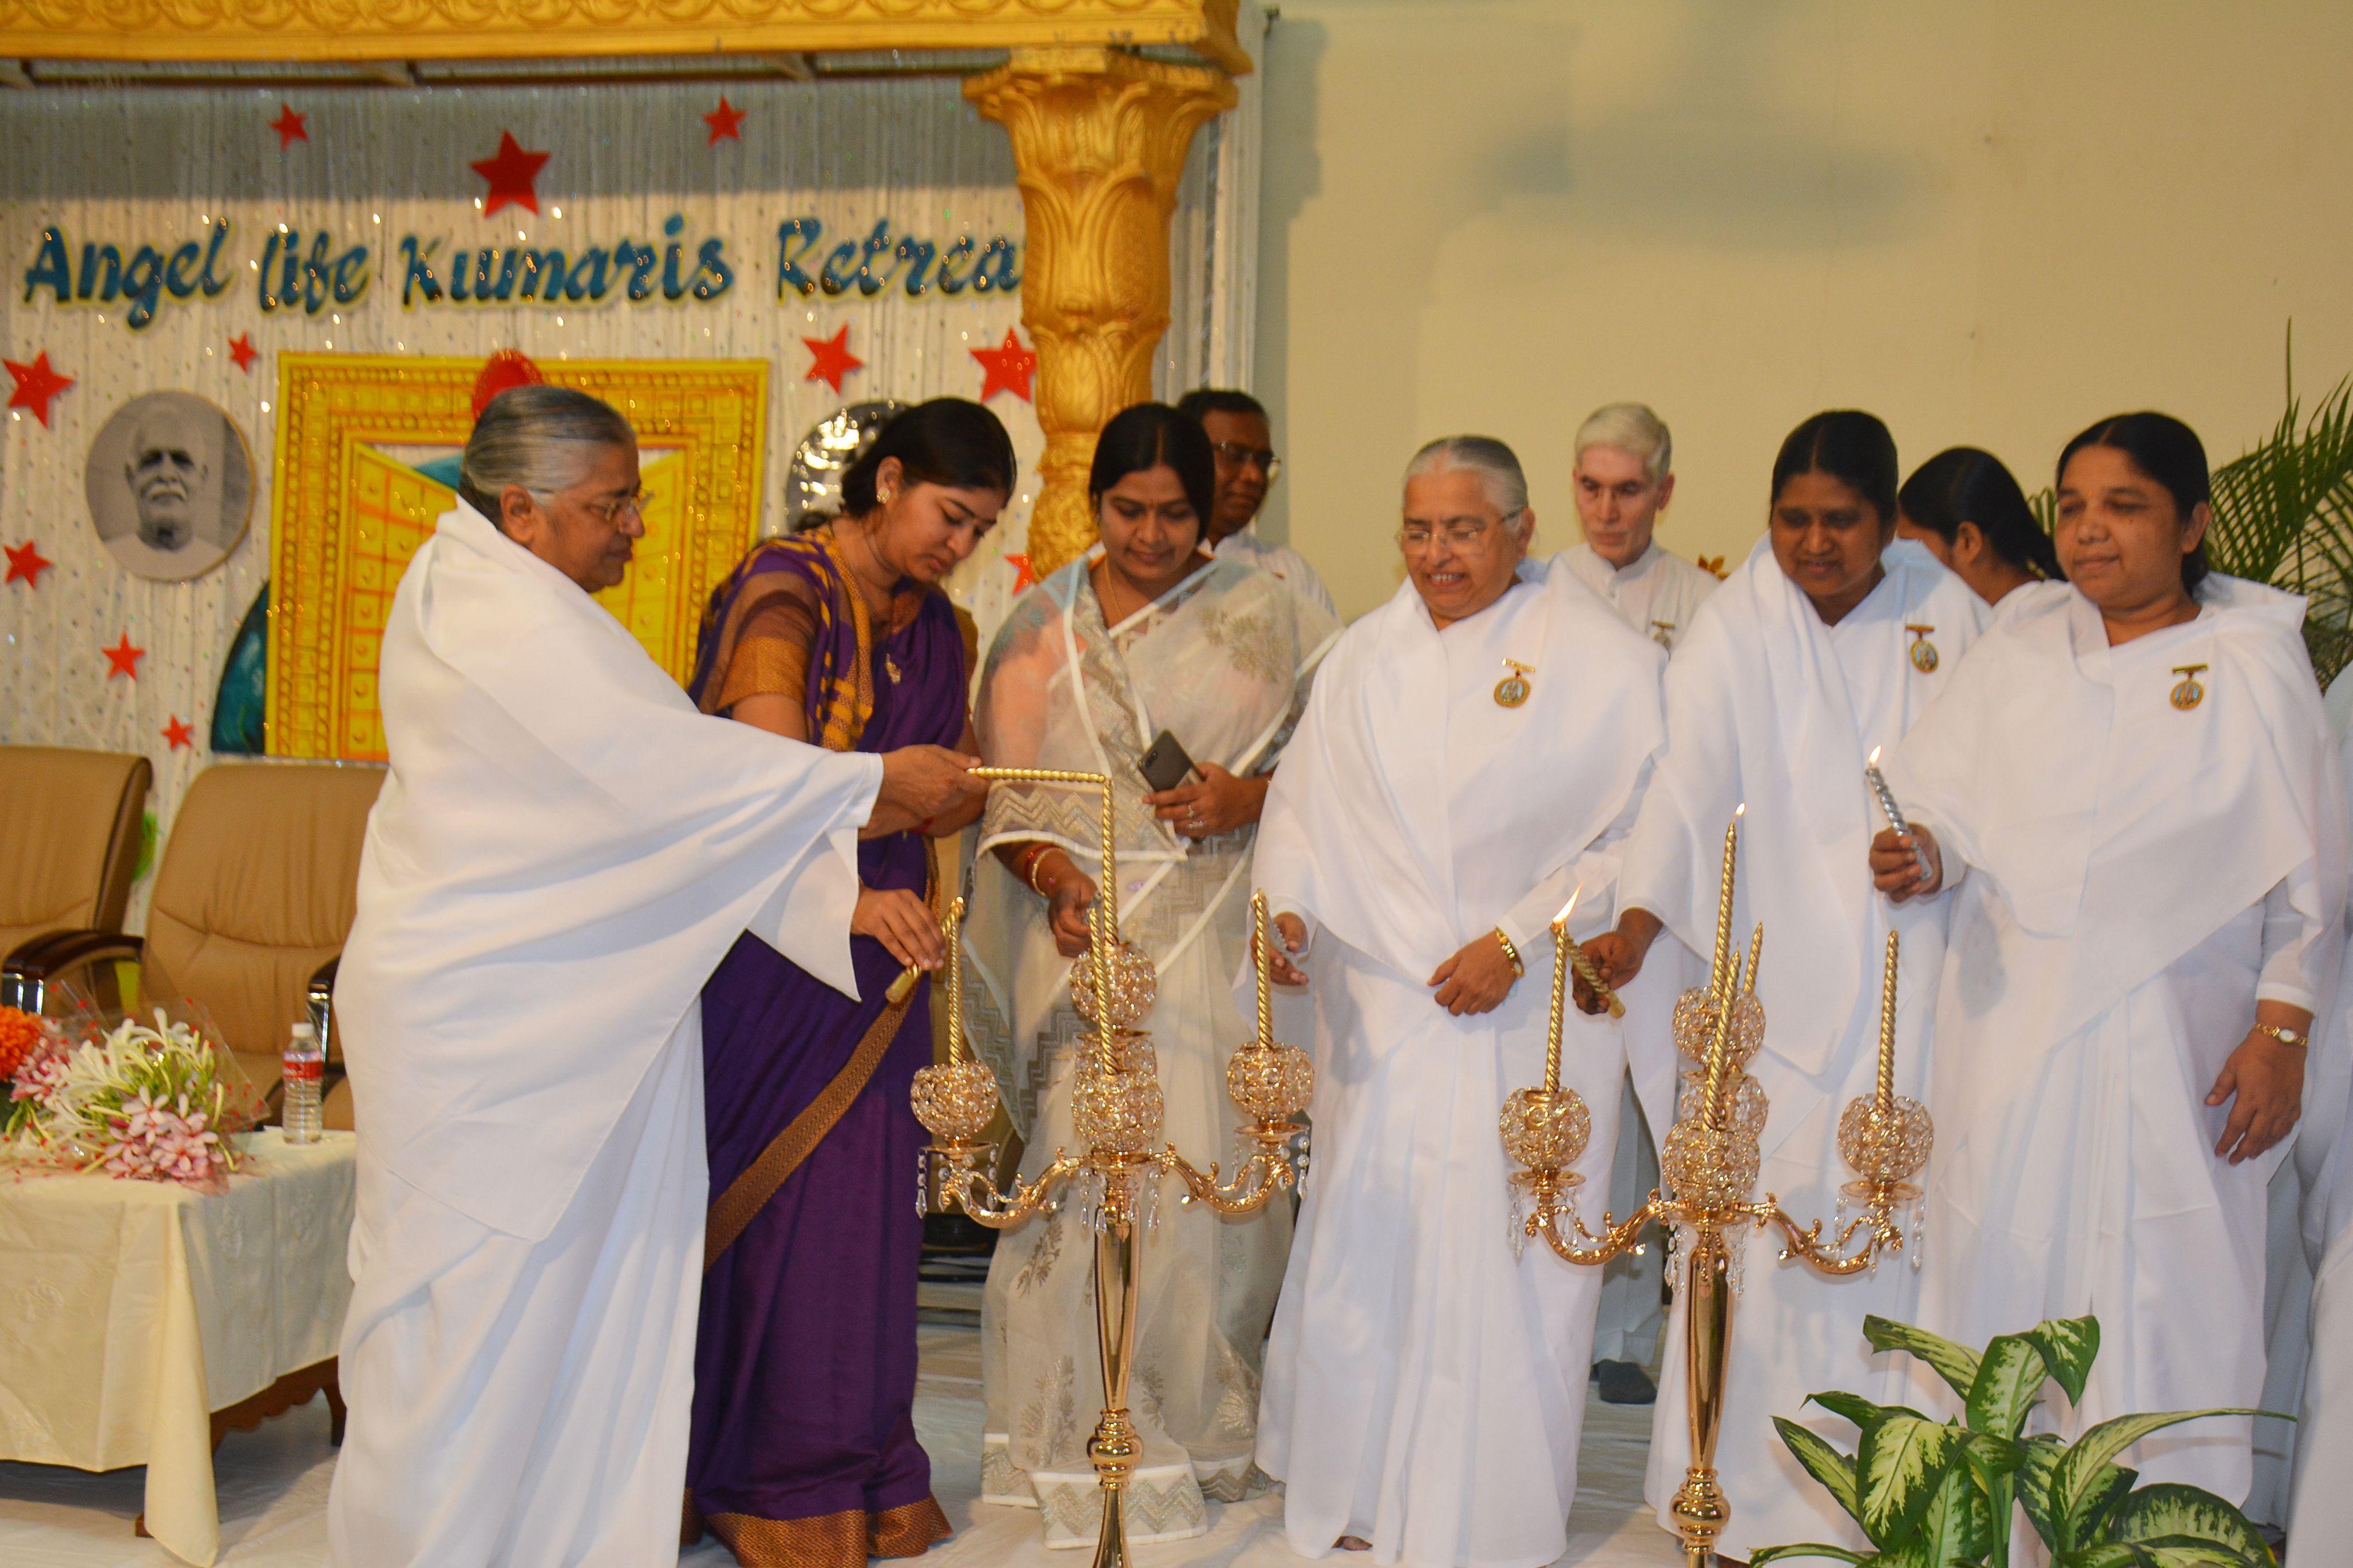 Angel Life Kumaris Retreat at Shanti Sarovar, Hyderabad